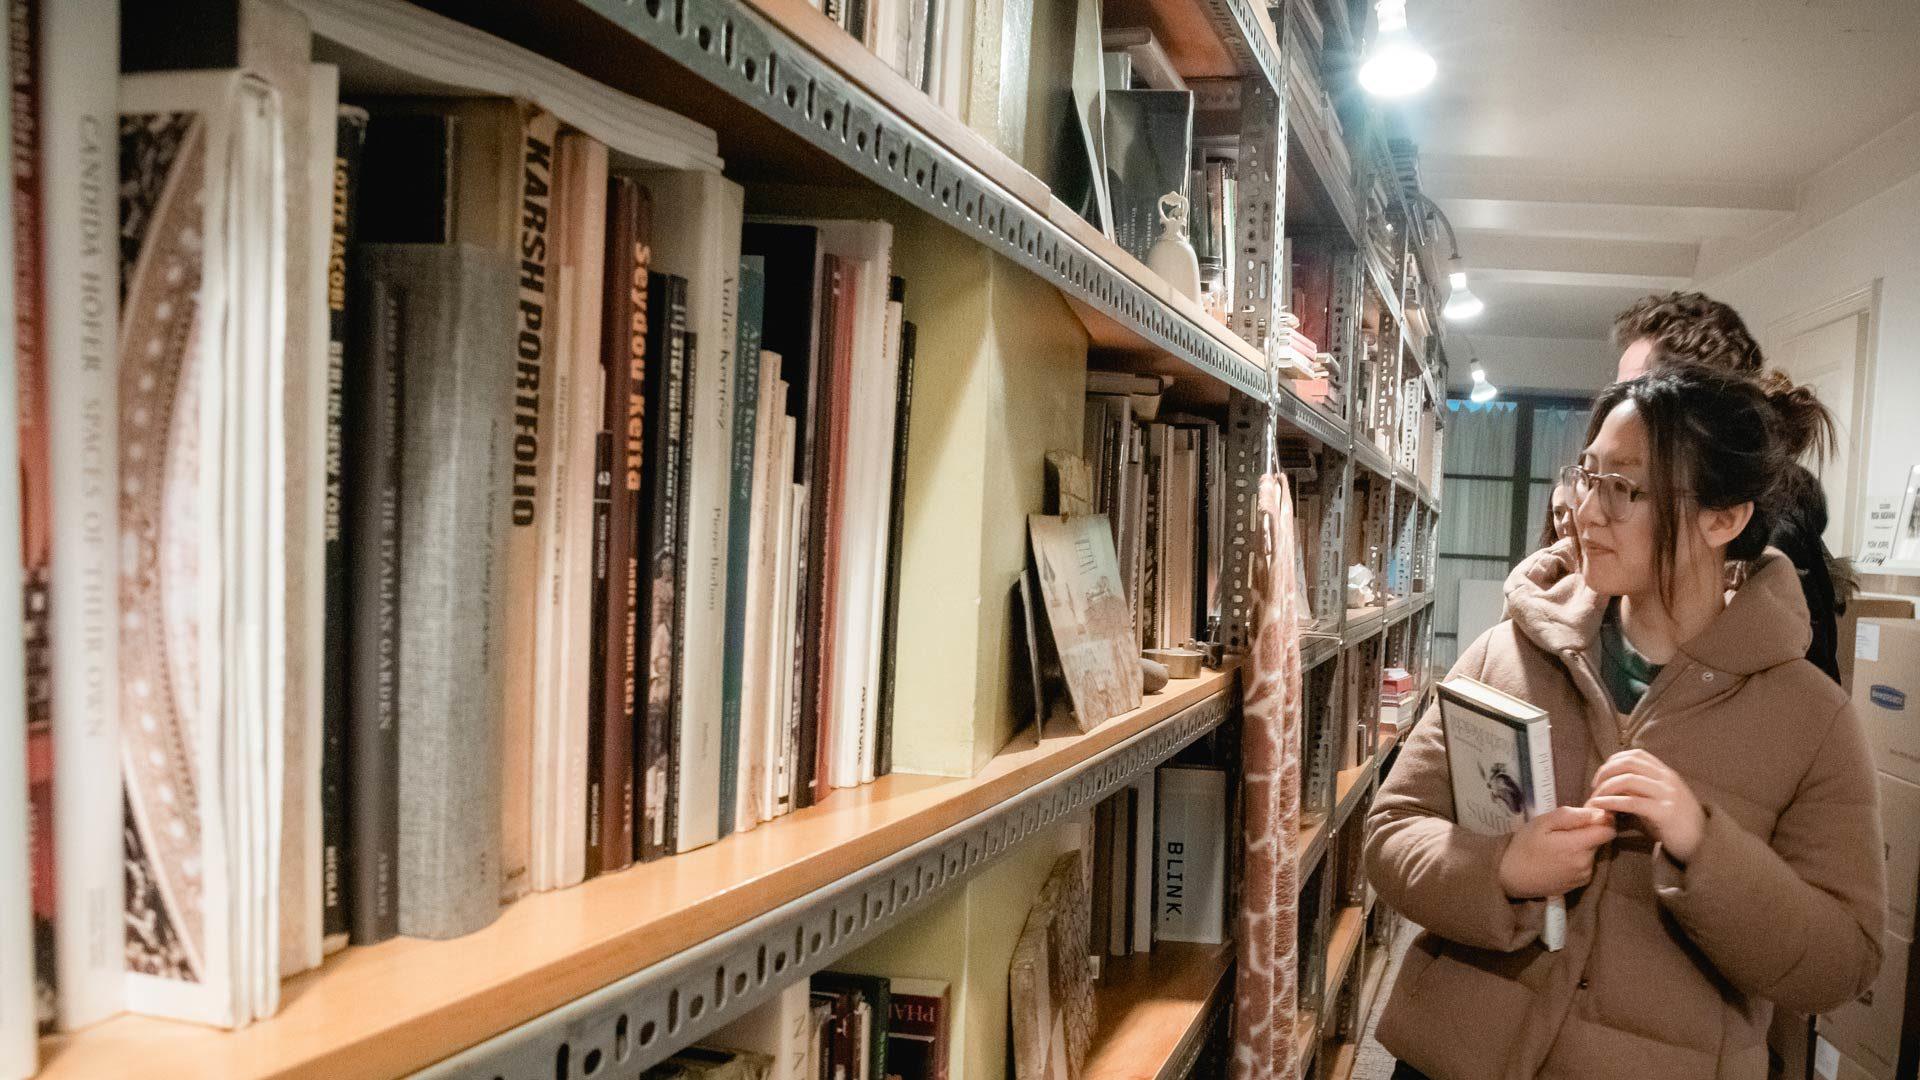 Maira Kalman's library and students